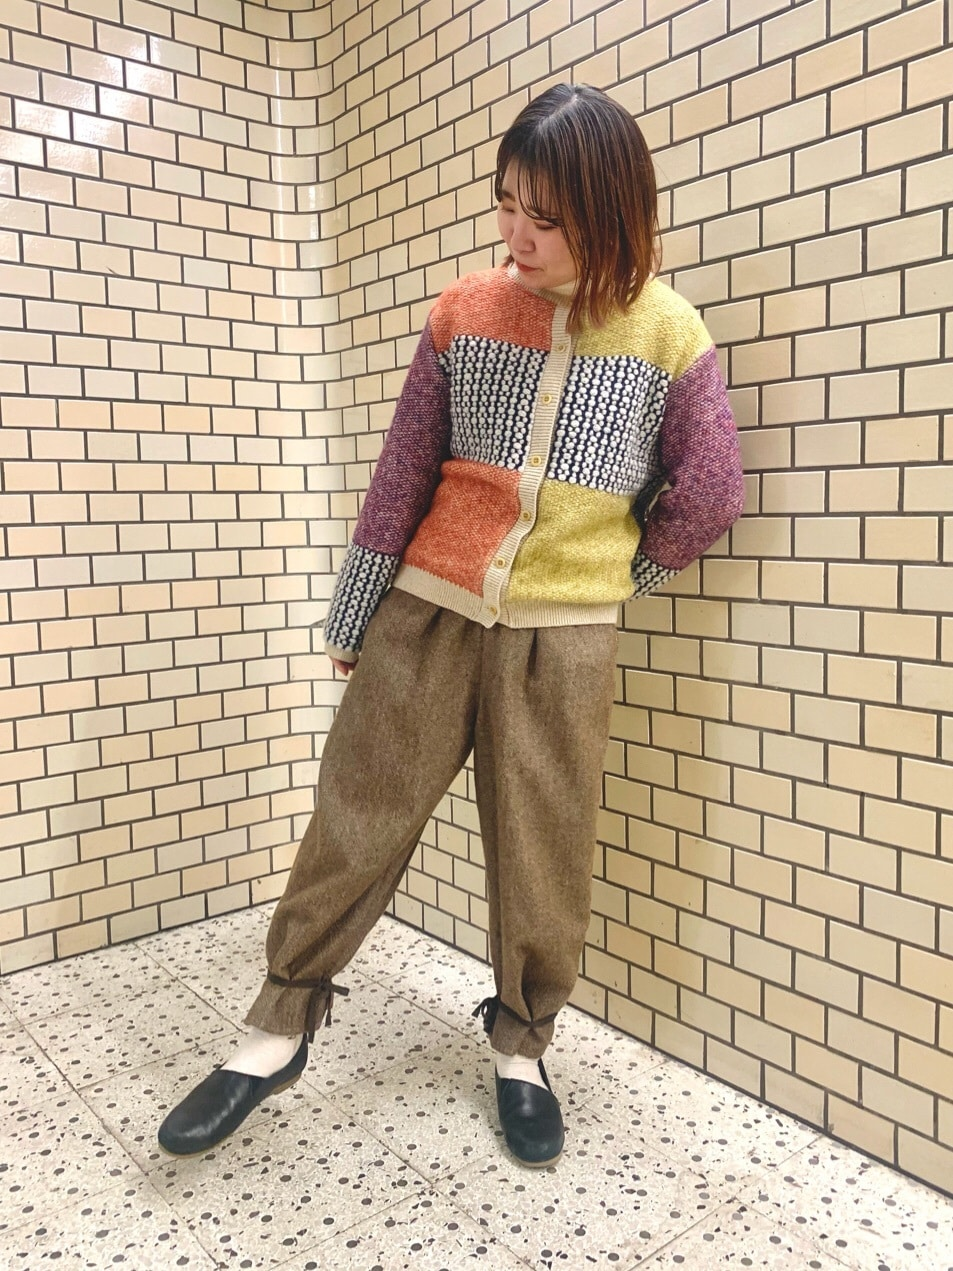 chambre de charme 横浜ジョイナス 身長:155cm 2020.11.27